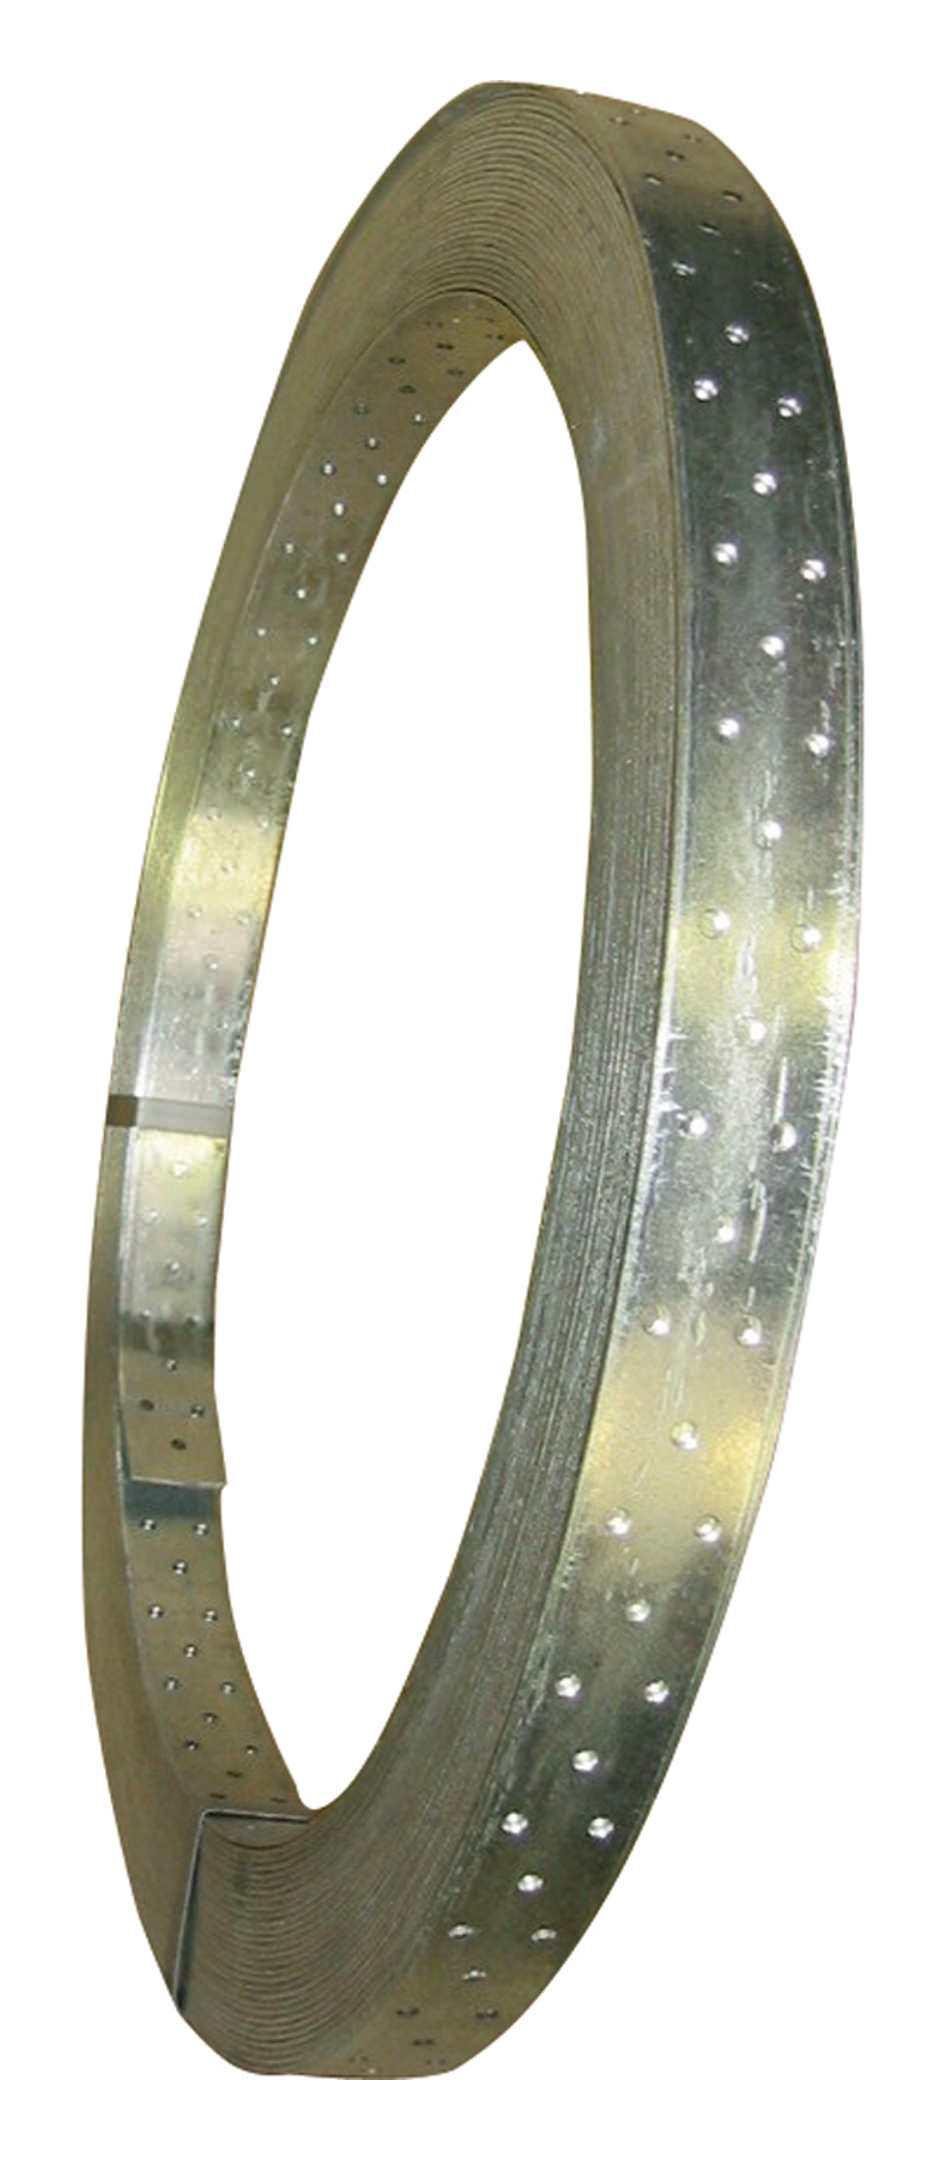 Windrispenband 40 x 1,5 mm